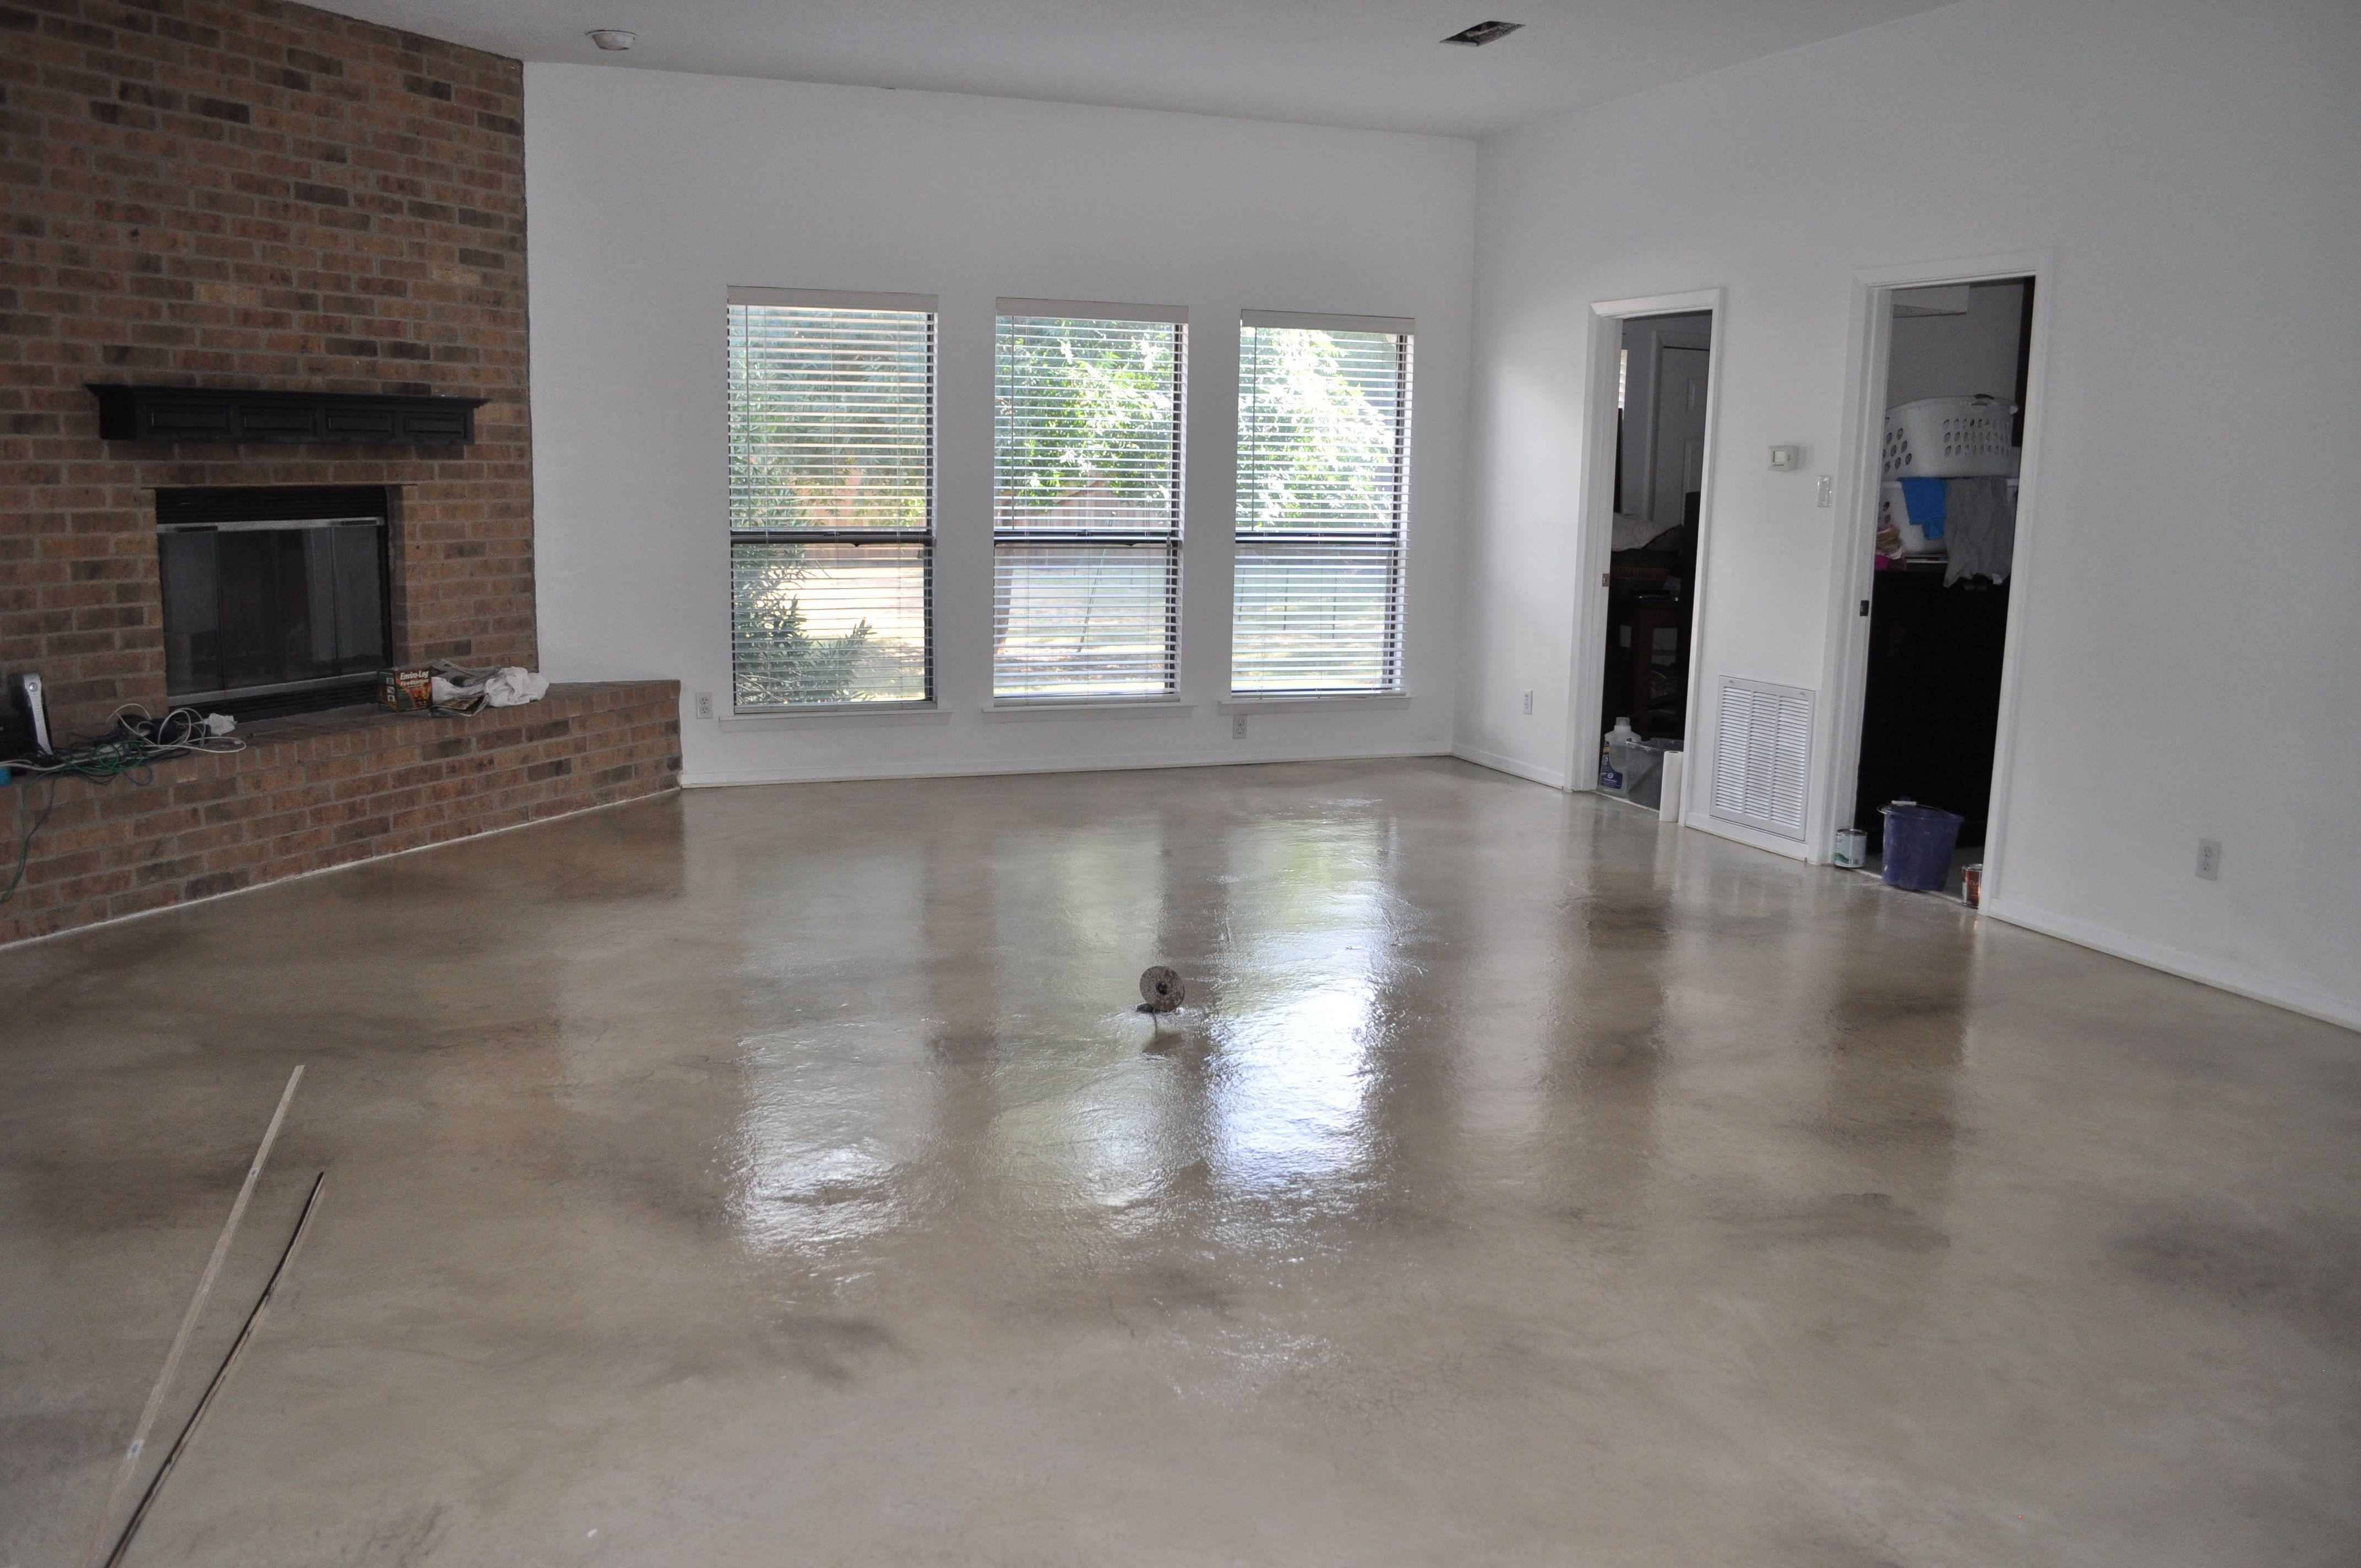 Hand Troweled Floor Decorative Concrete Works Beautiful Custom Floors Call Us At 8178322055 Or Visit Us At Www Dallasd Concrete Decor Custom Floor Concrete